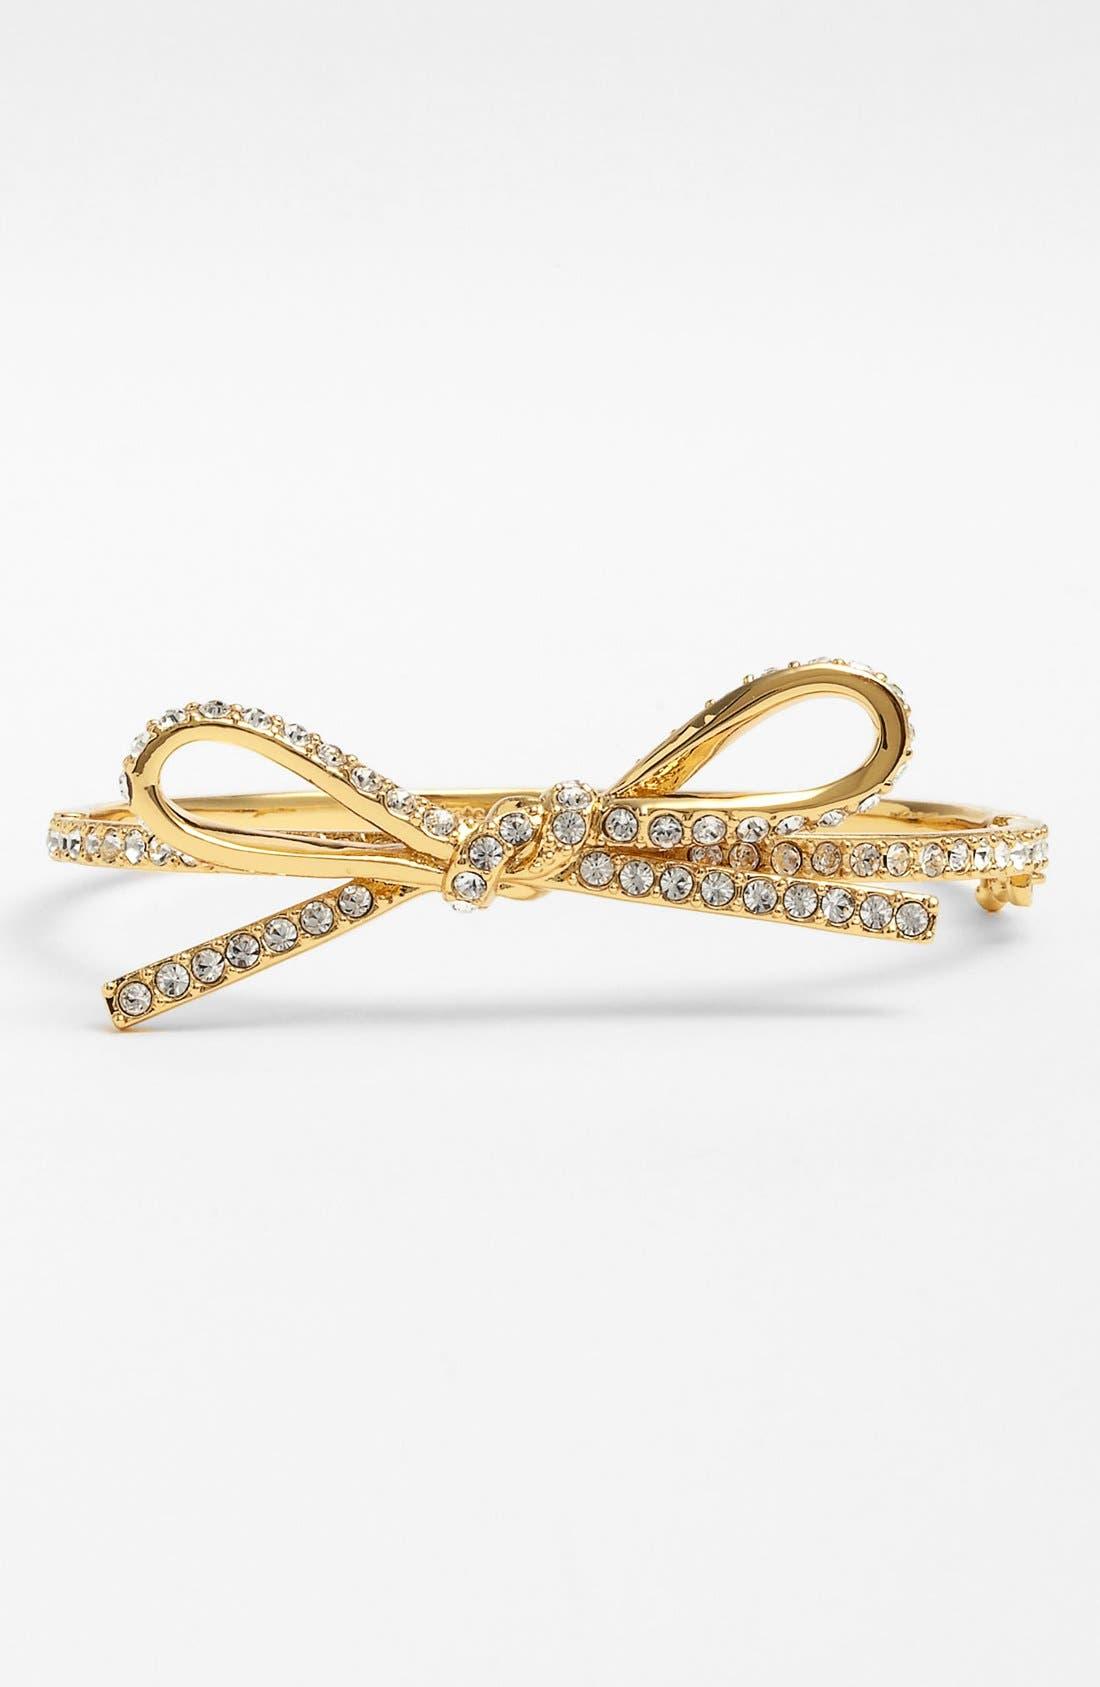 Main Image - kate spade new york 'skinny mini' bow bangle